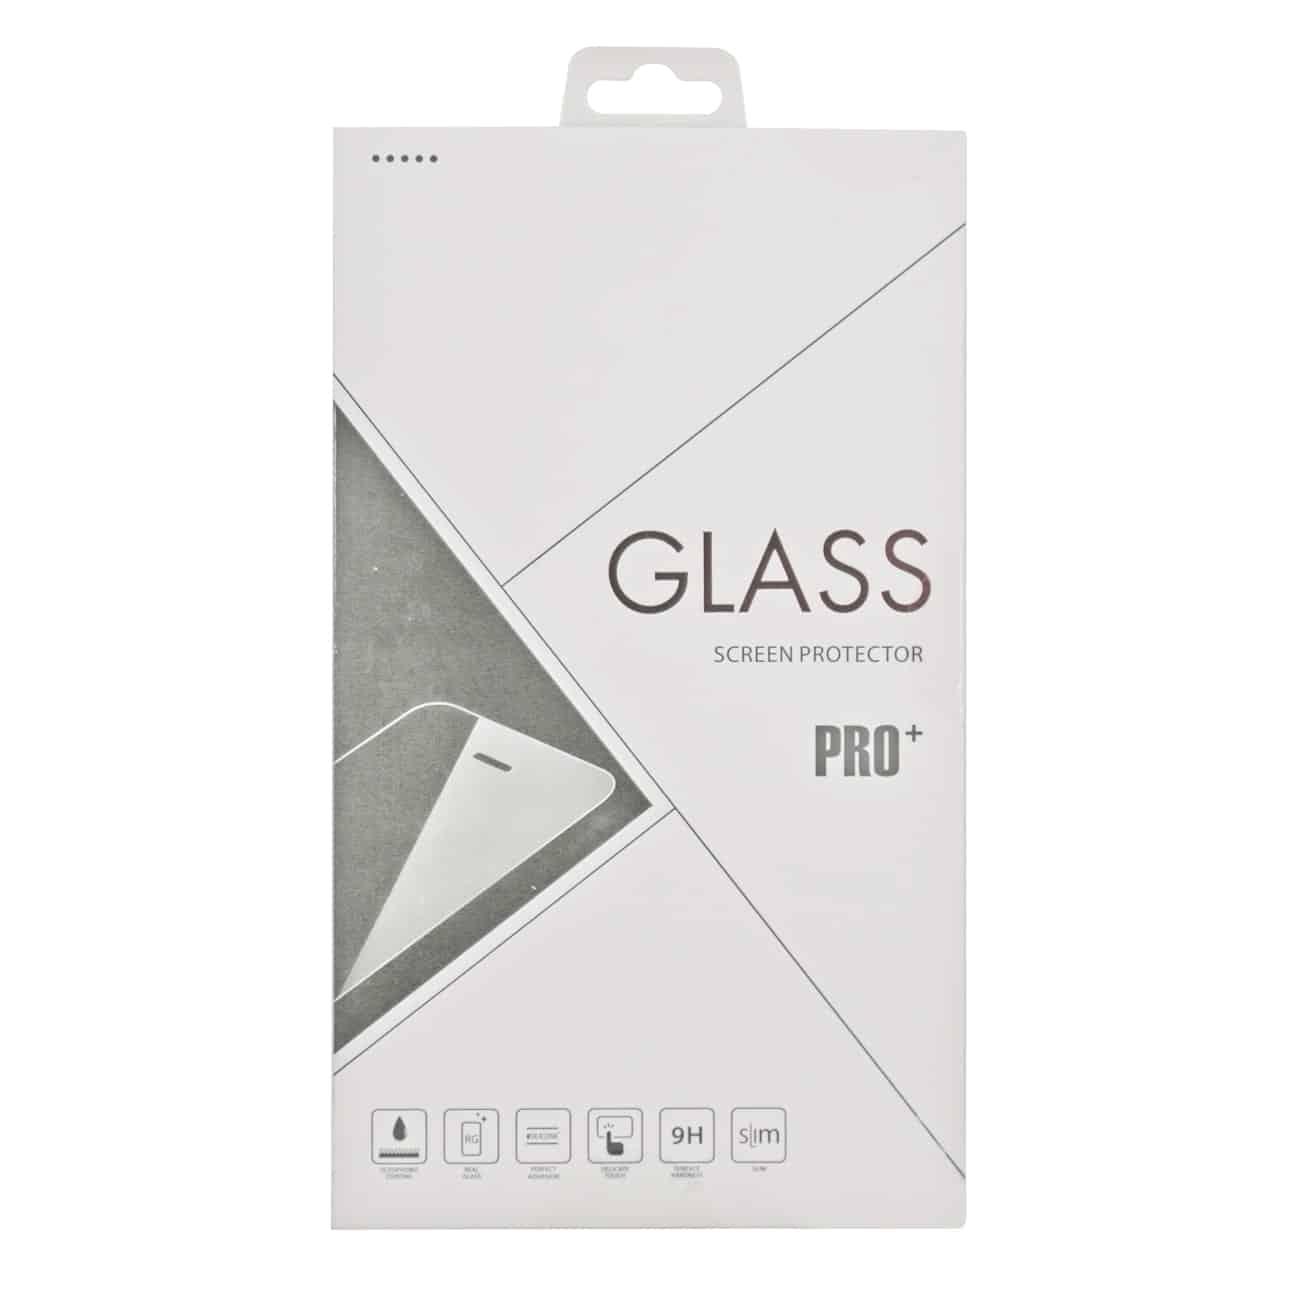 ISTIK APPLE IPHONE XS MAX/APPLE IPHONE 11 PRO MAX 2.5D Regular glass